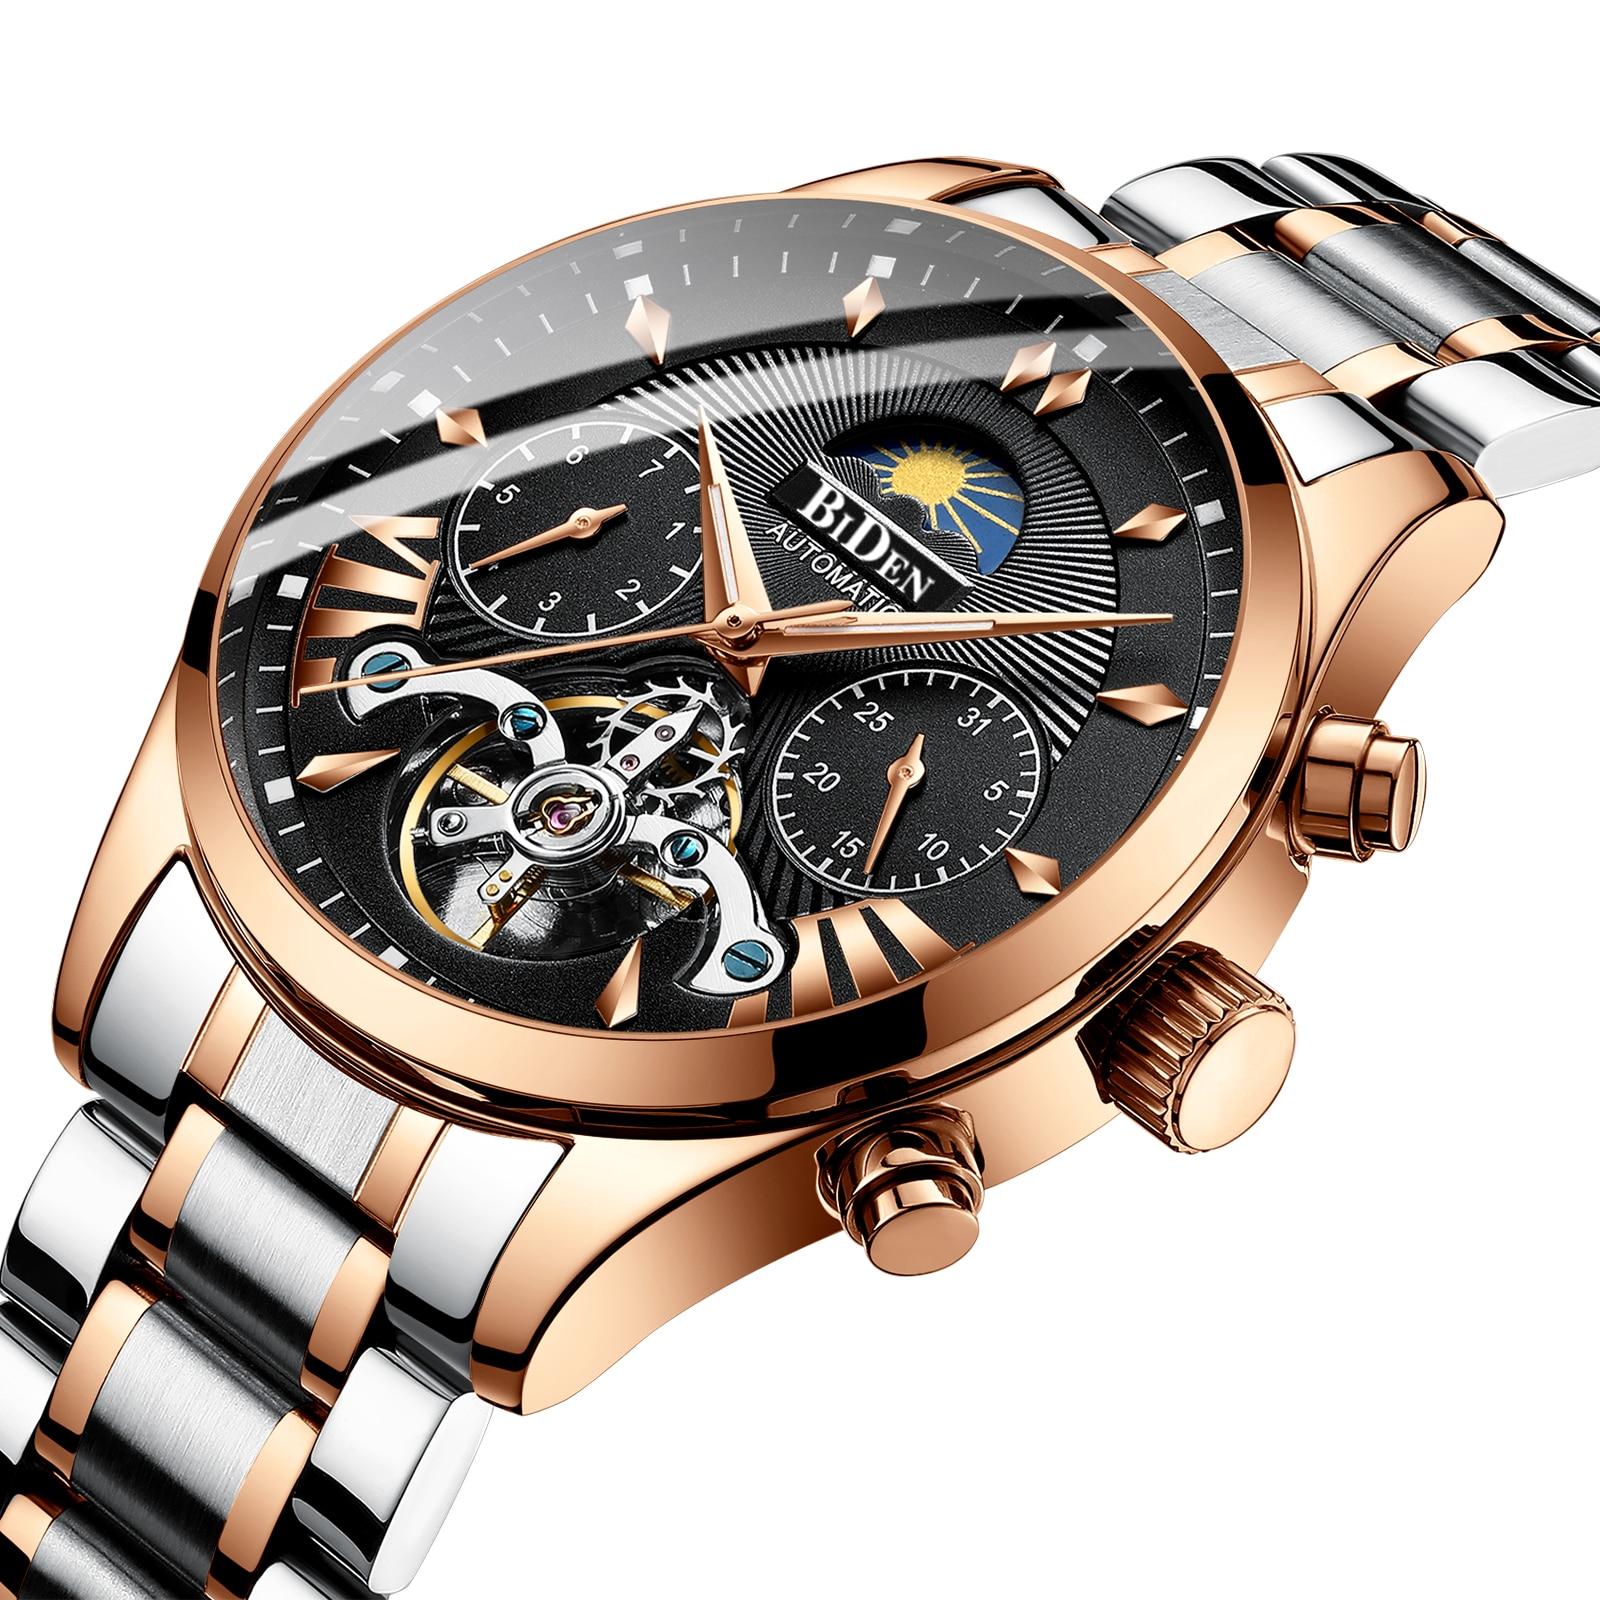 2020 New Men Sport Wristwatch Mens Reloj Hombre Tourbillon Men's Watches Top Brand Luxury Watch